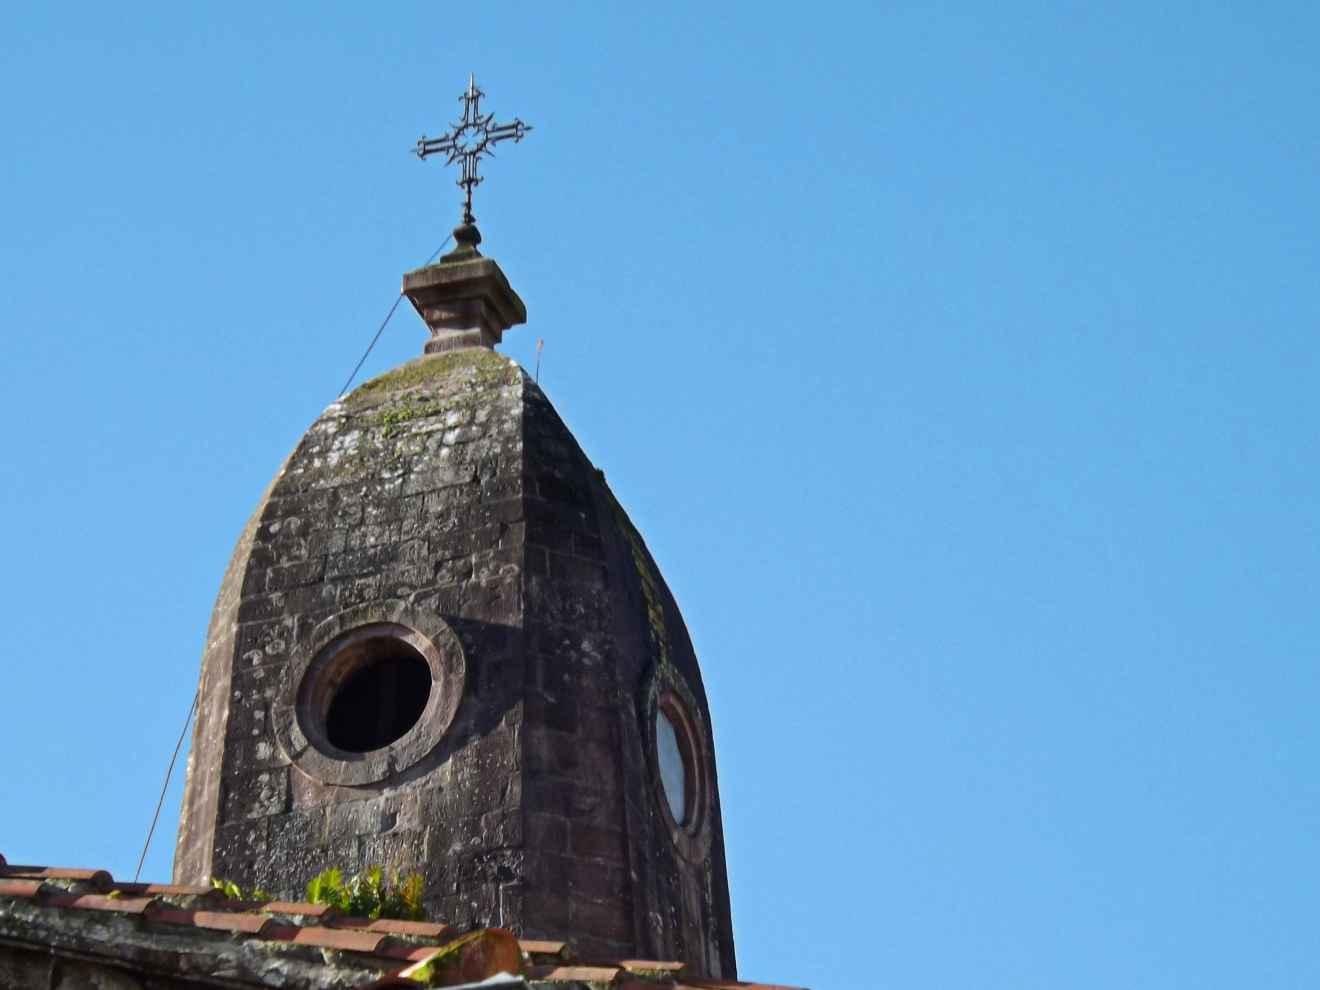 Chapitel modernista de la Iglesia de Cabezón de la Sal